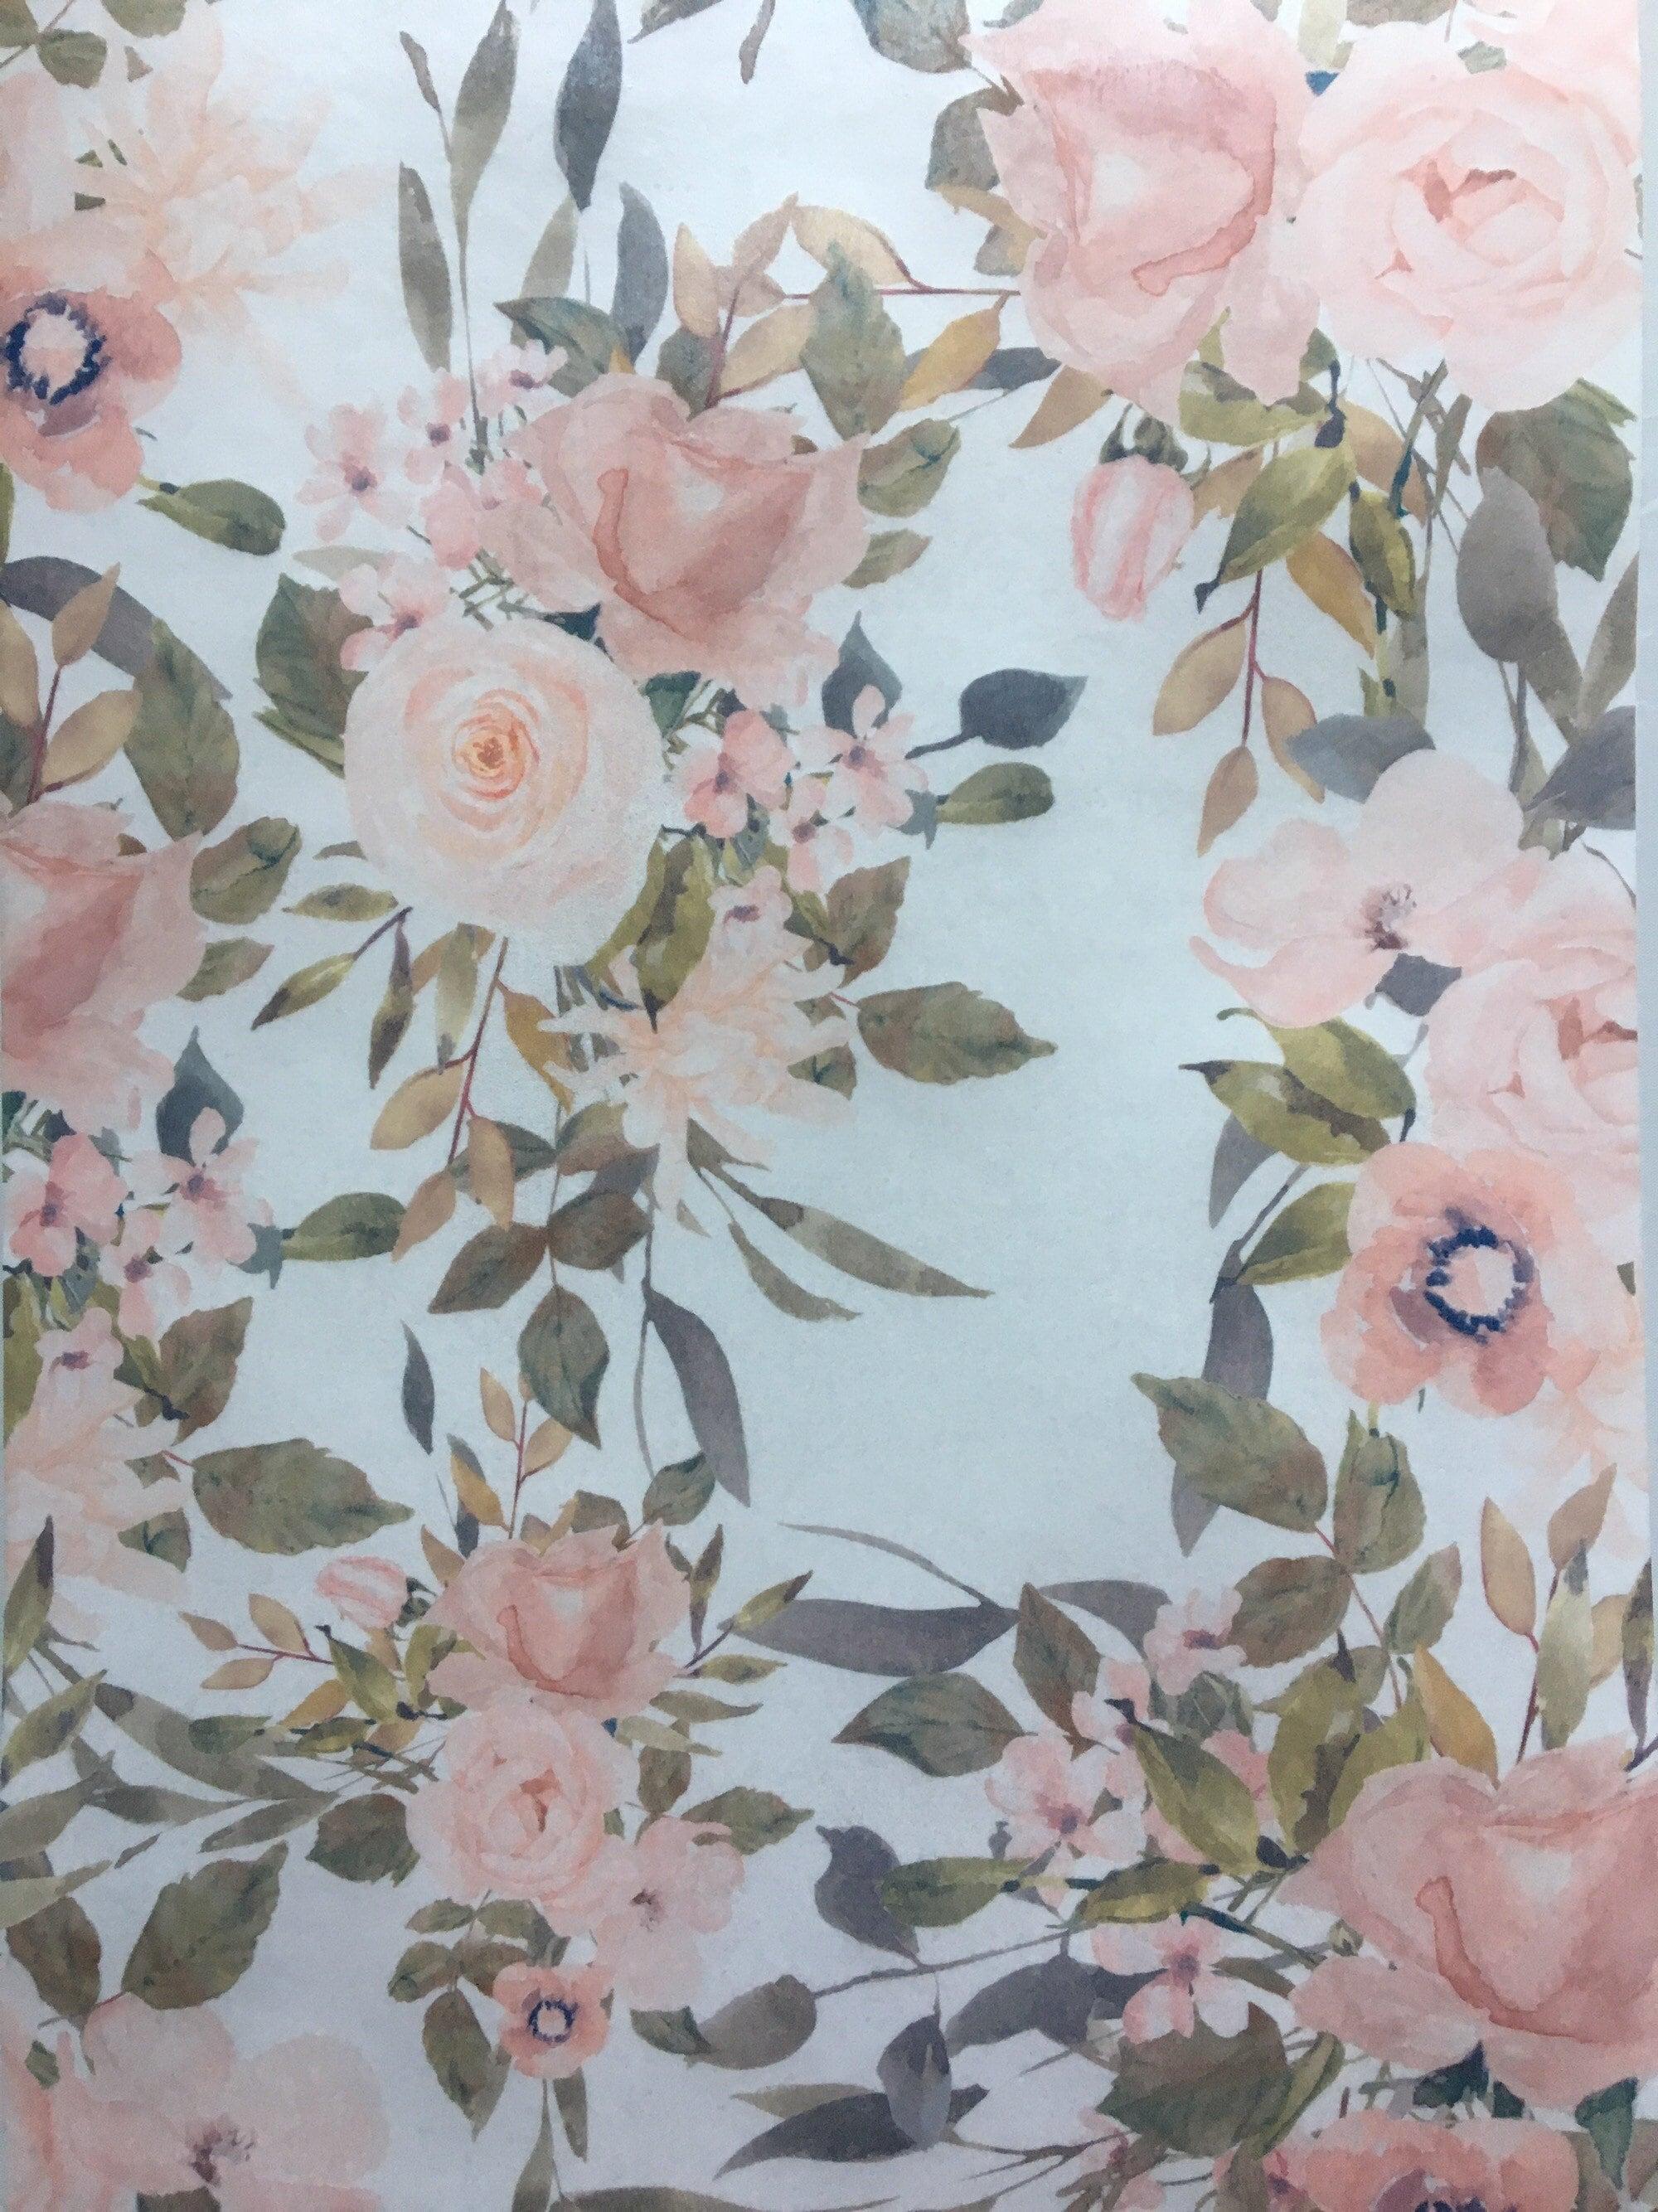 Blush Floral Edible Wafer Paper Etsy